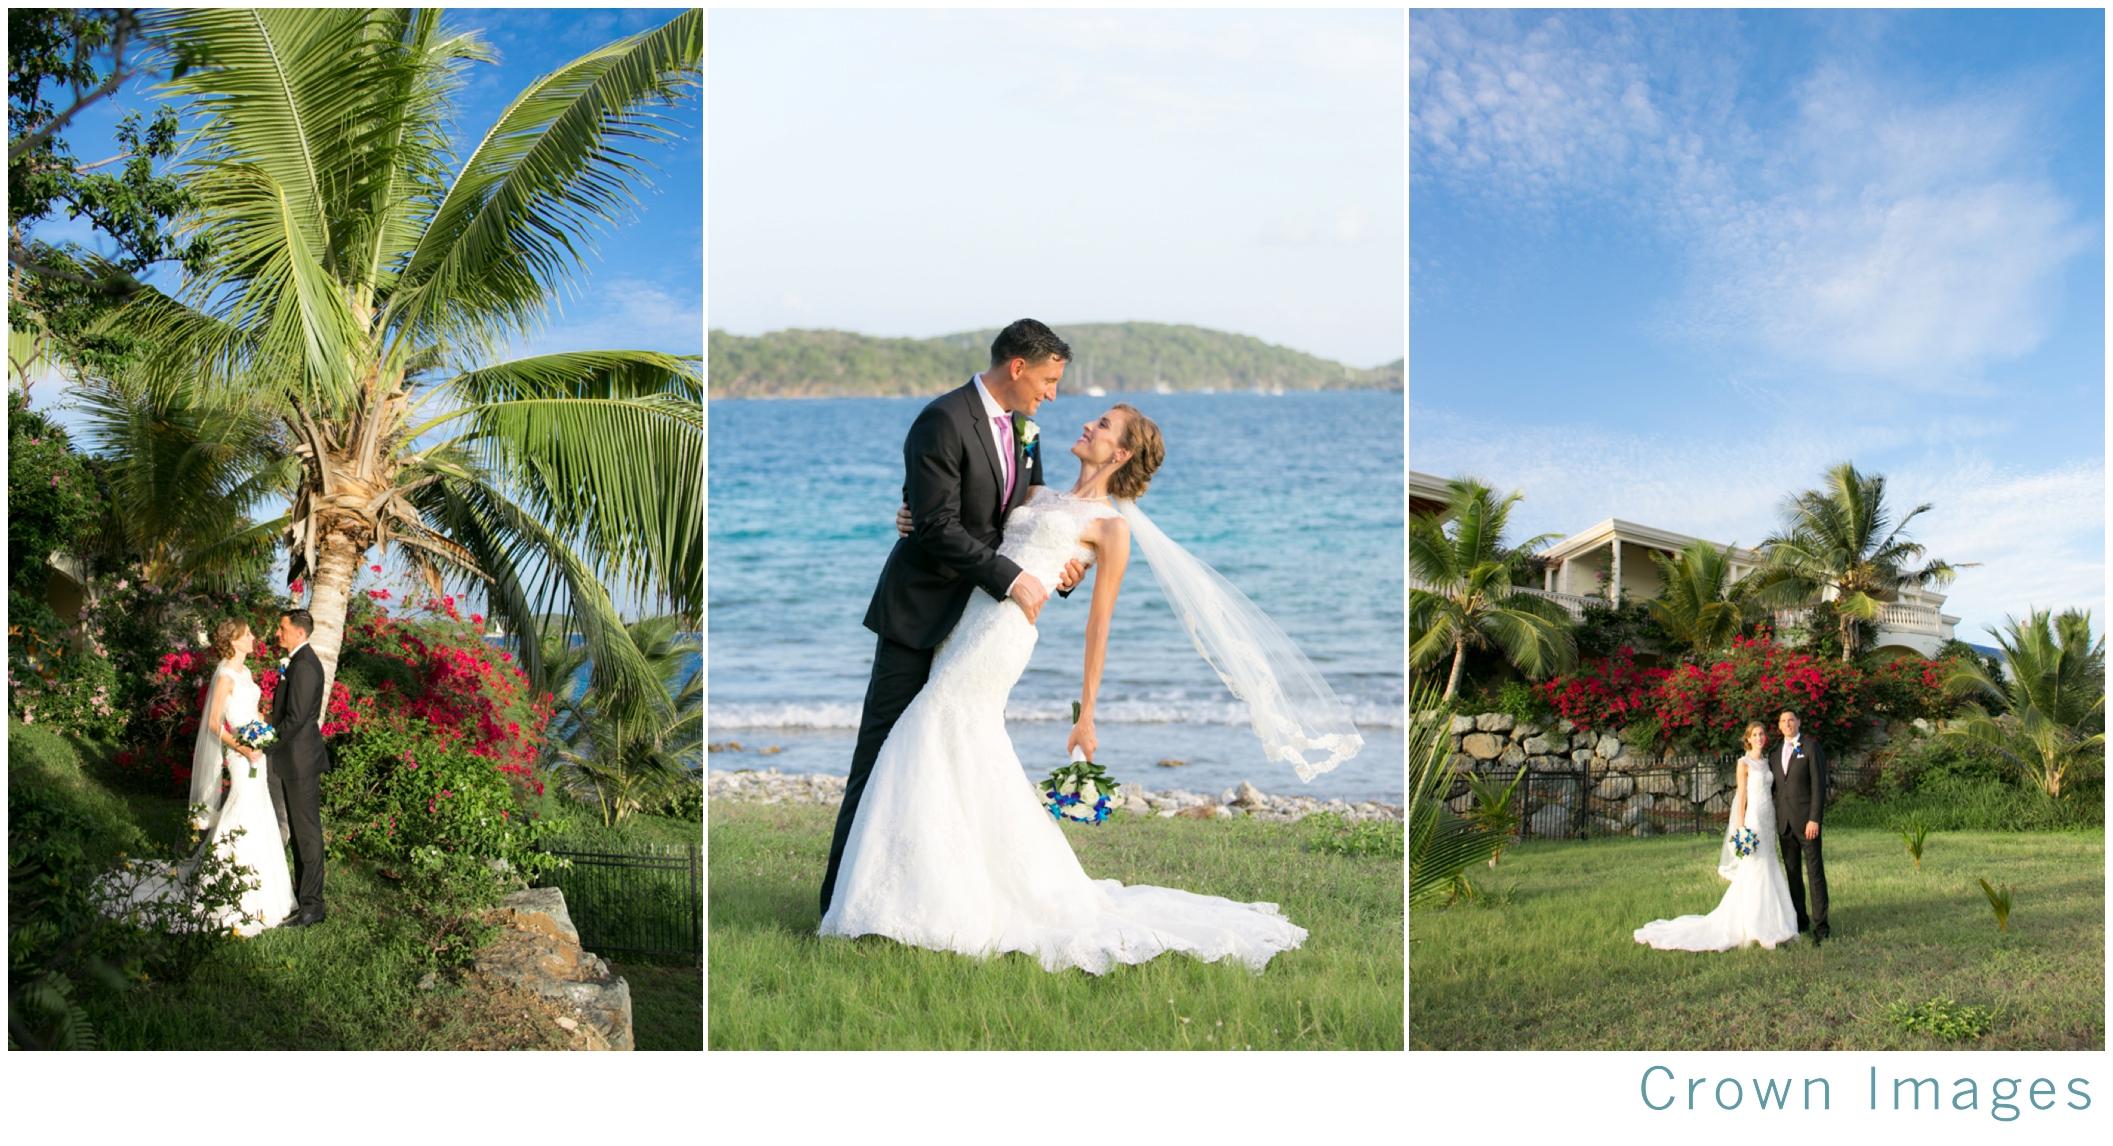 wedding photos by crown images st thomas virgin islands_1938.jpg